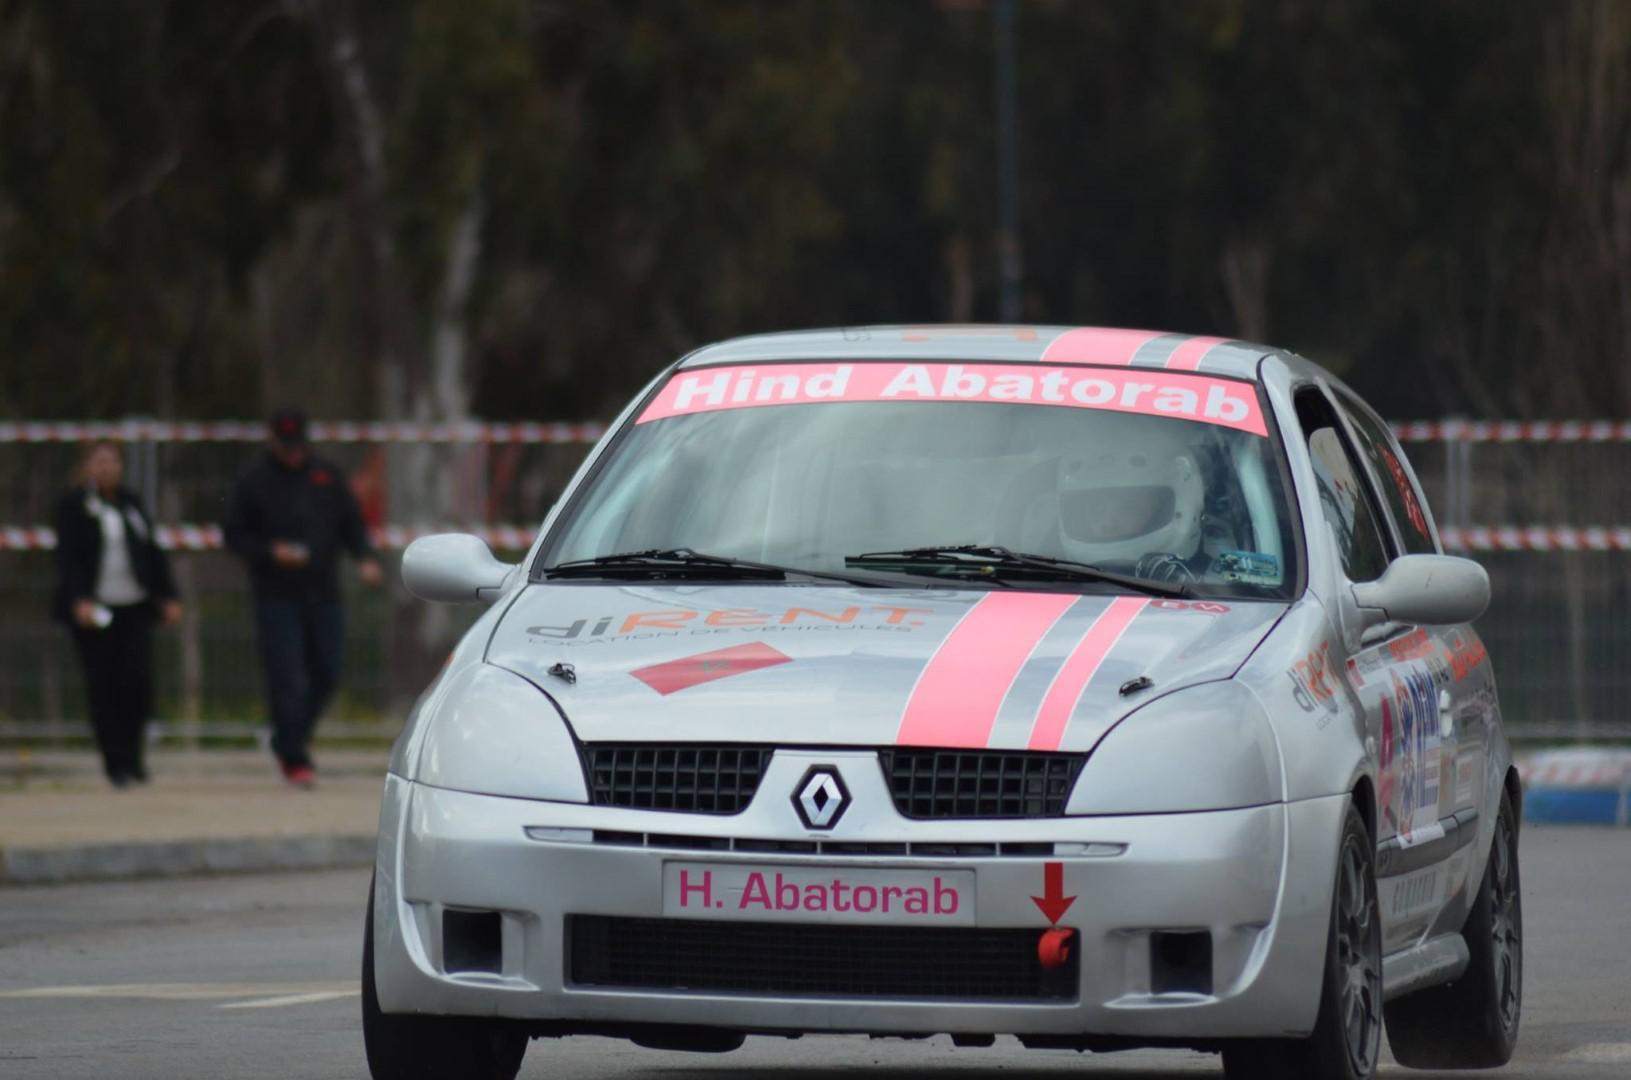 hind-abatorab-championne-du-maroc-des-circuits-2016-102-2.jpg